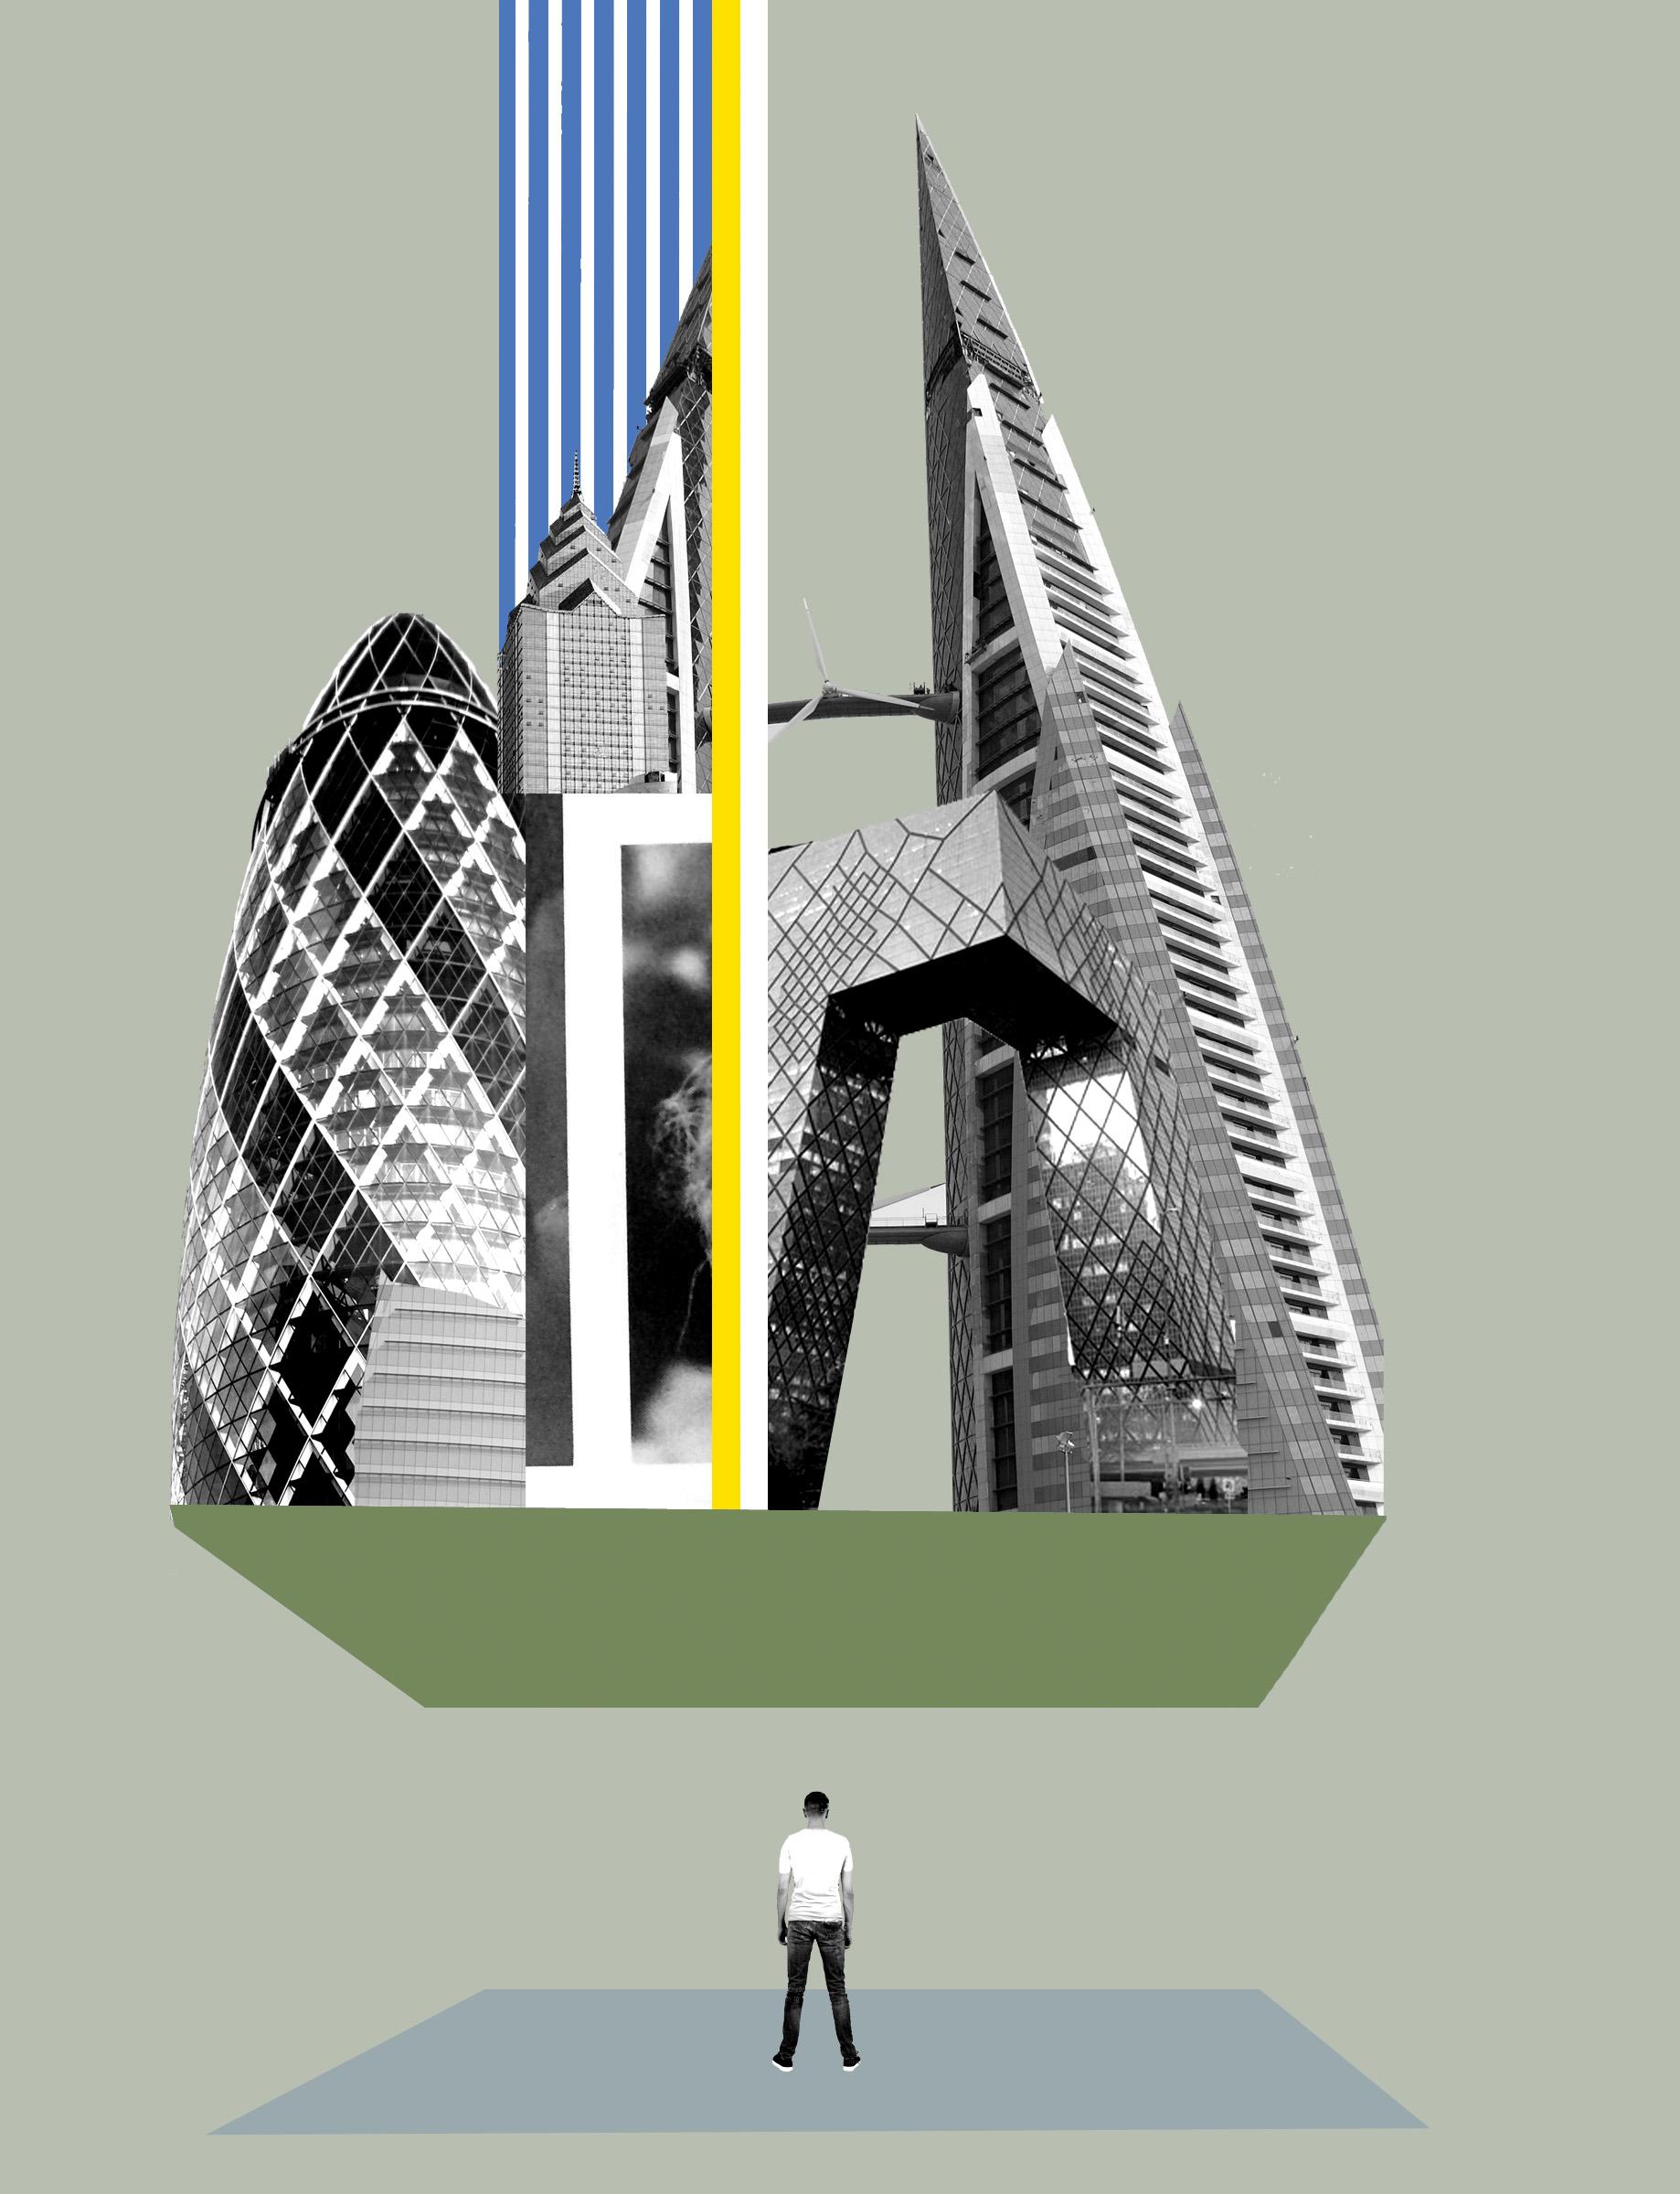 SF小説で描かれる未来都市はどう変わったか